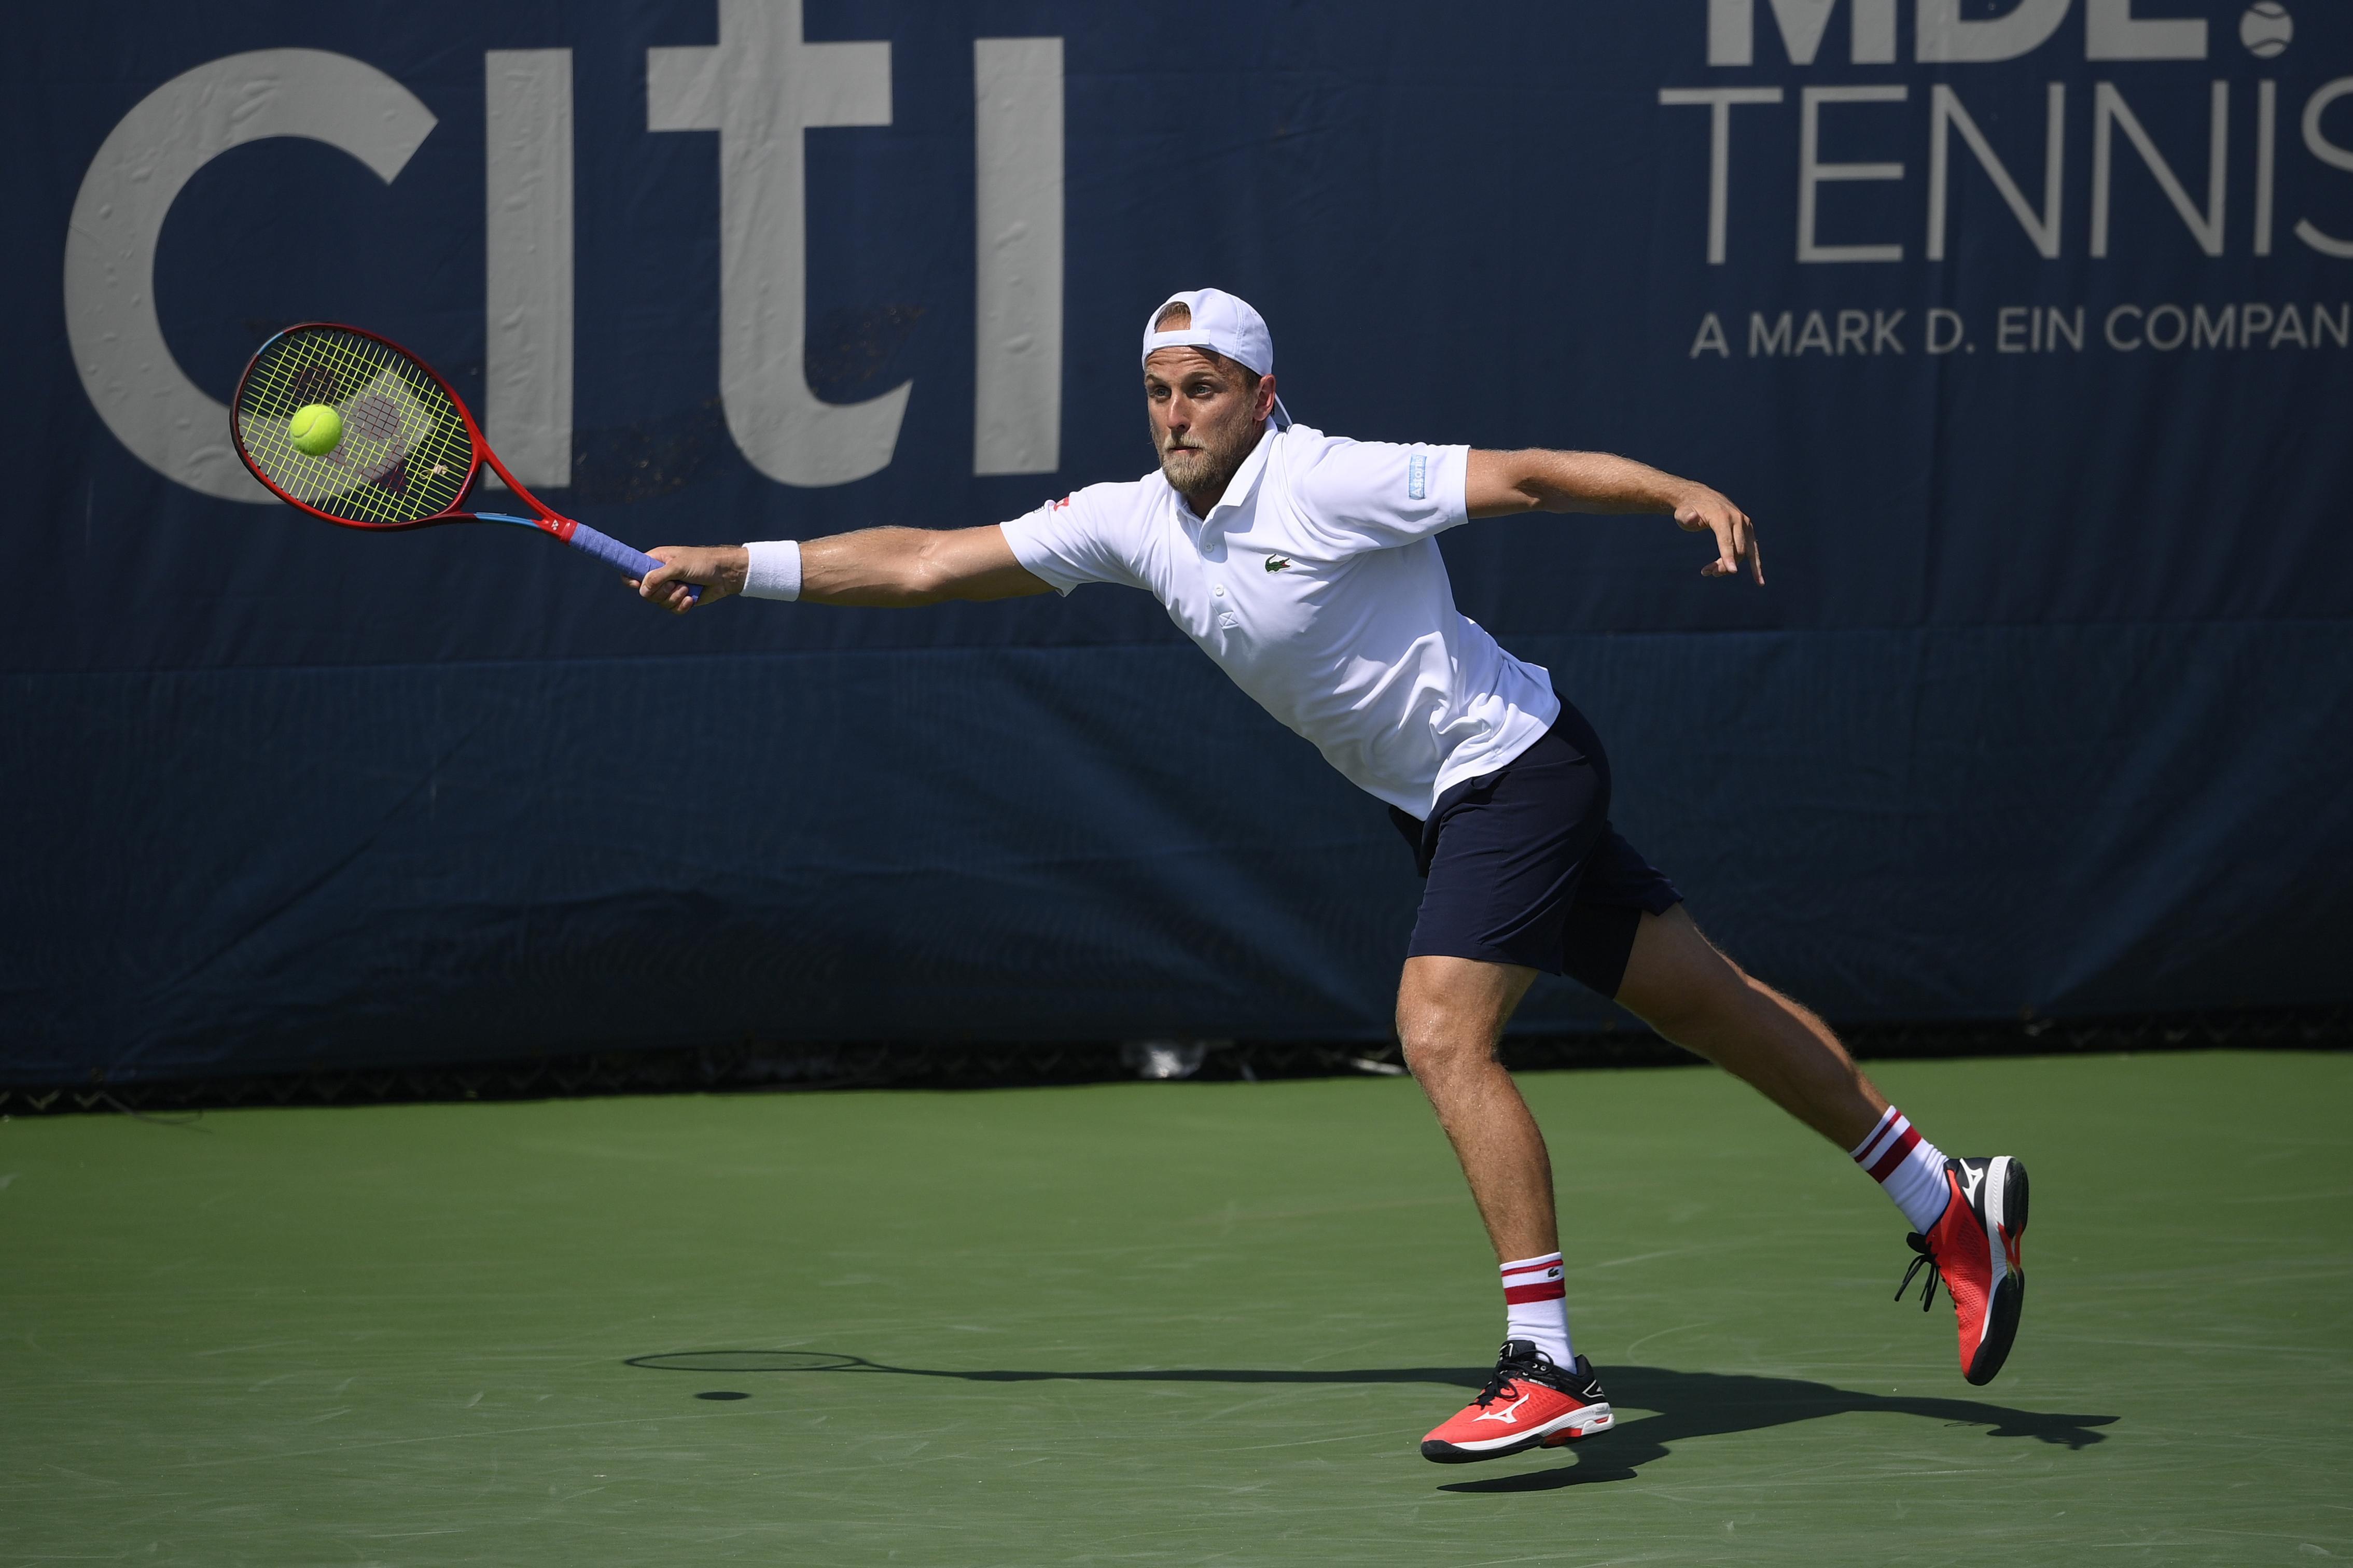 Washington Open 2021: Denis Kudla vs. Mackenzie McDonald Tennis Pick and Prediction